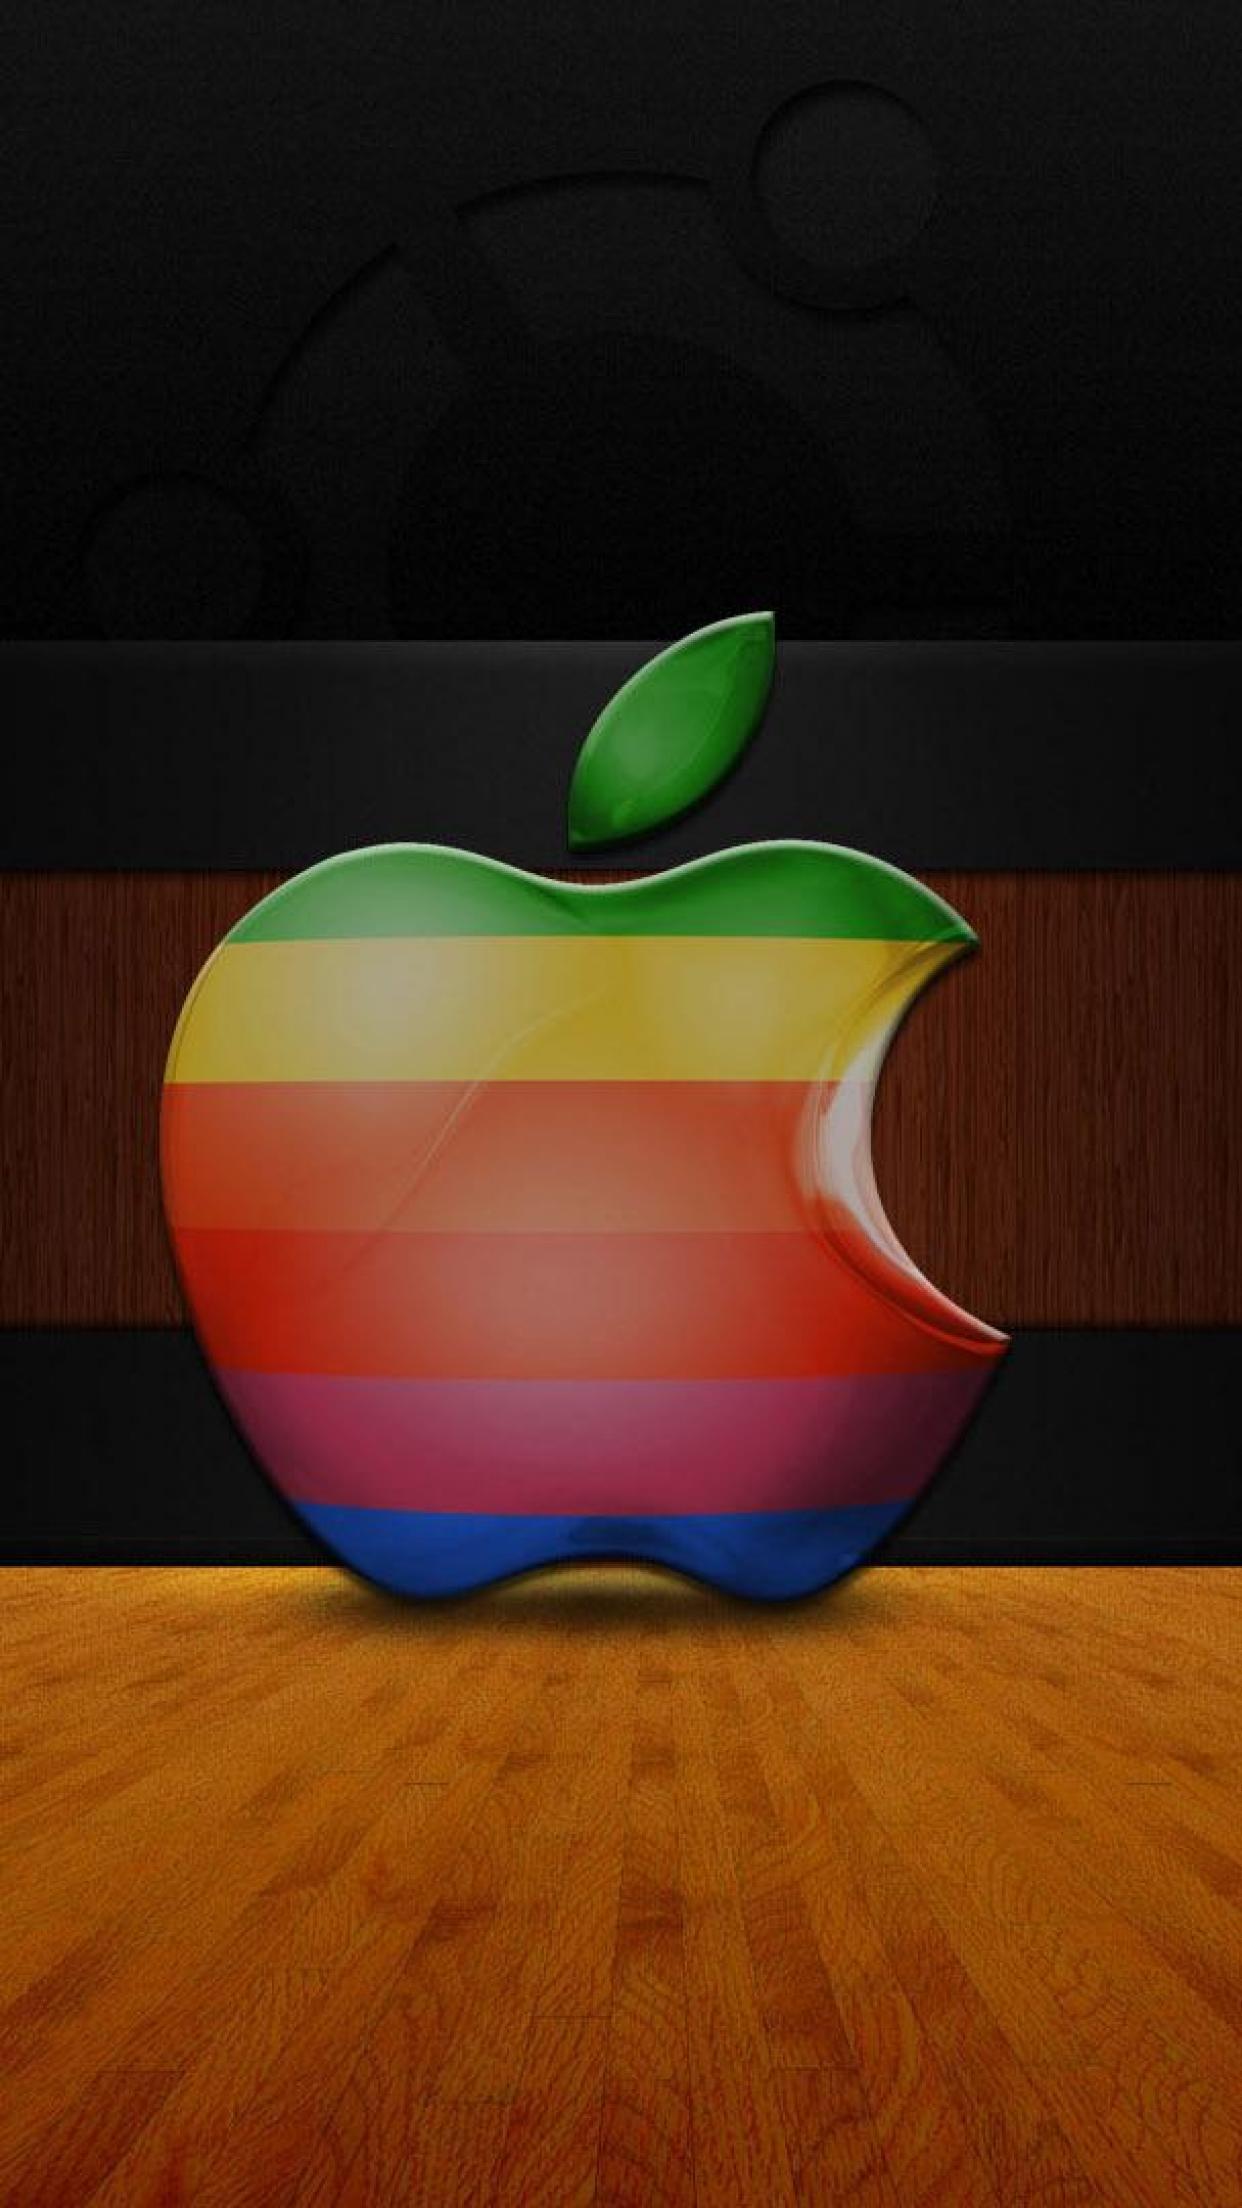 3d Wallpaper Parallax Free Apple Logo 3d Wallpaper For Iphone X 8 7 6 Free